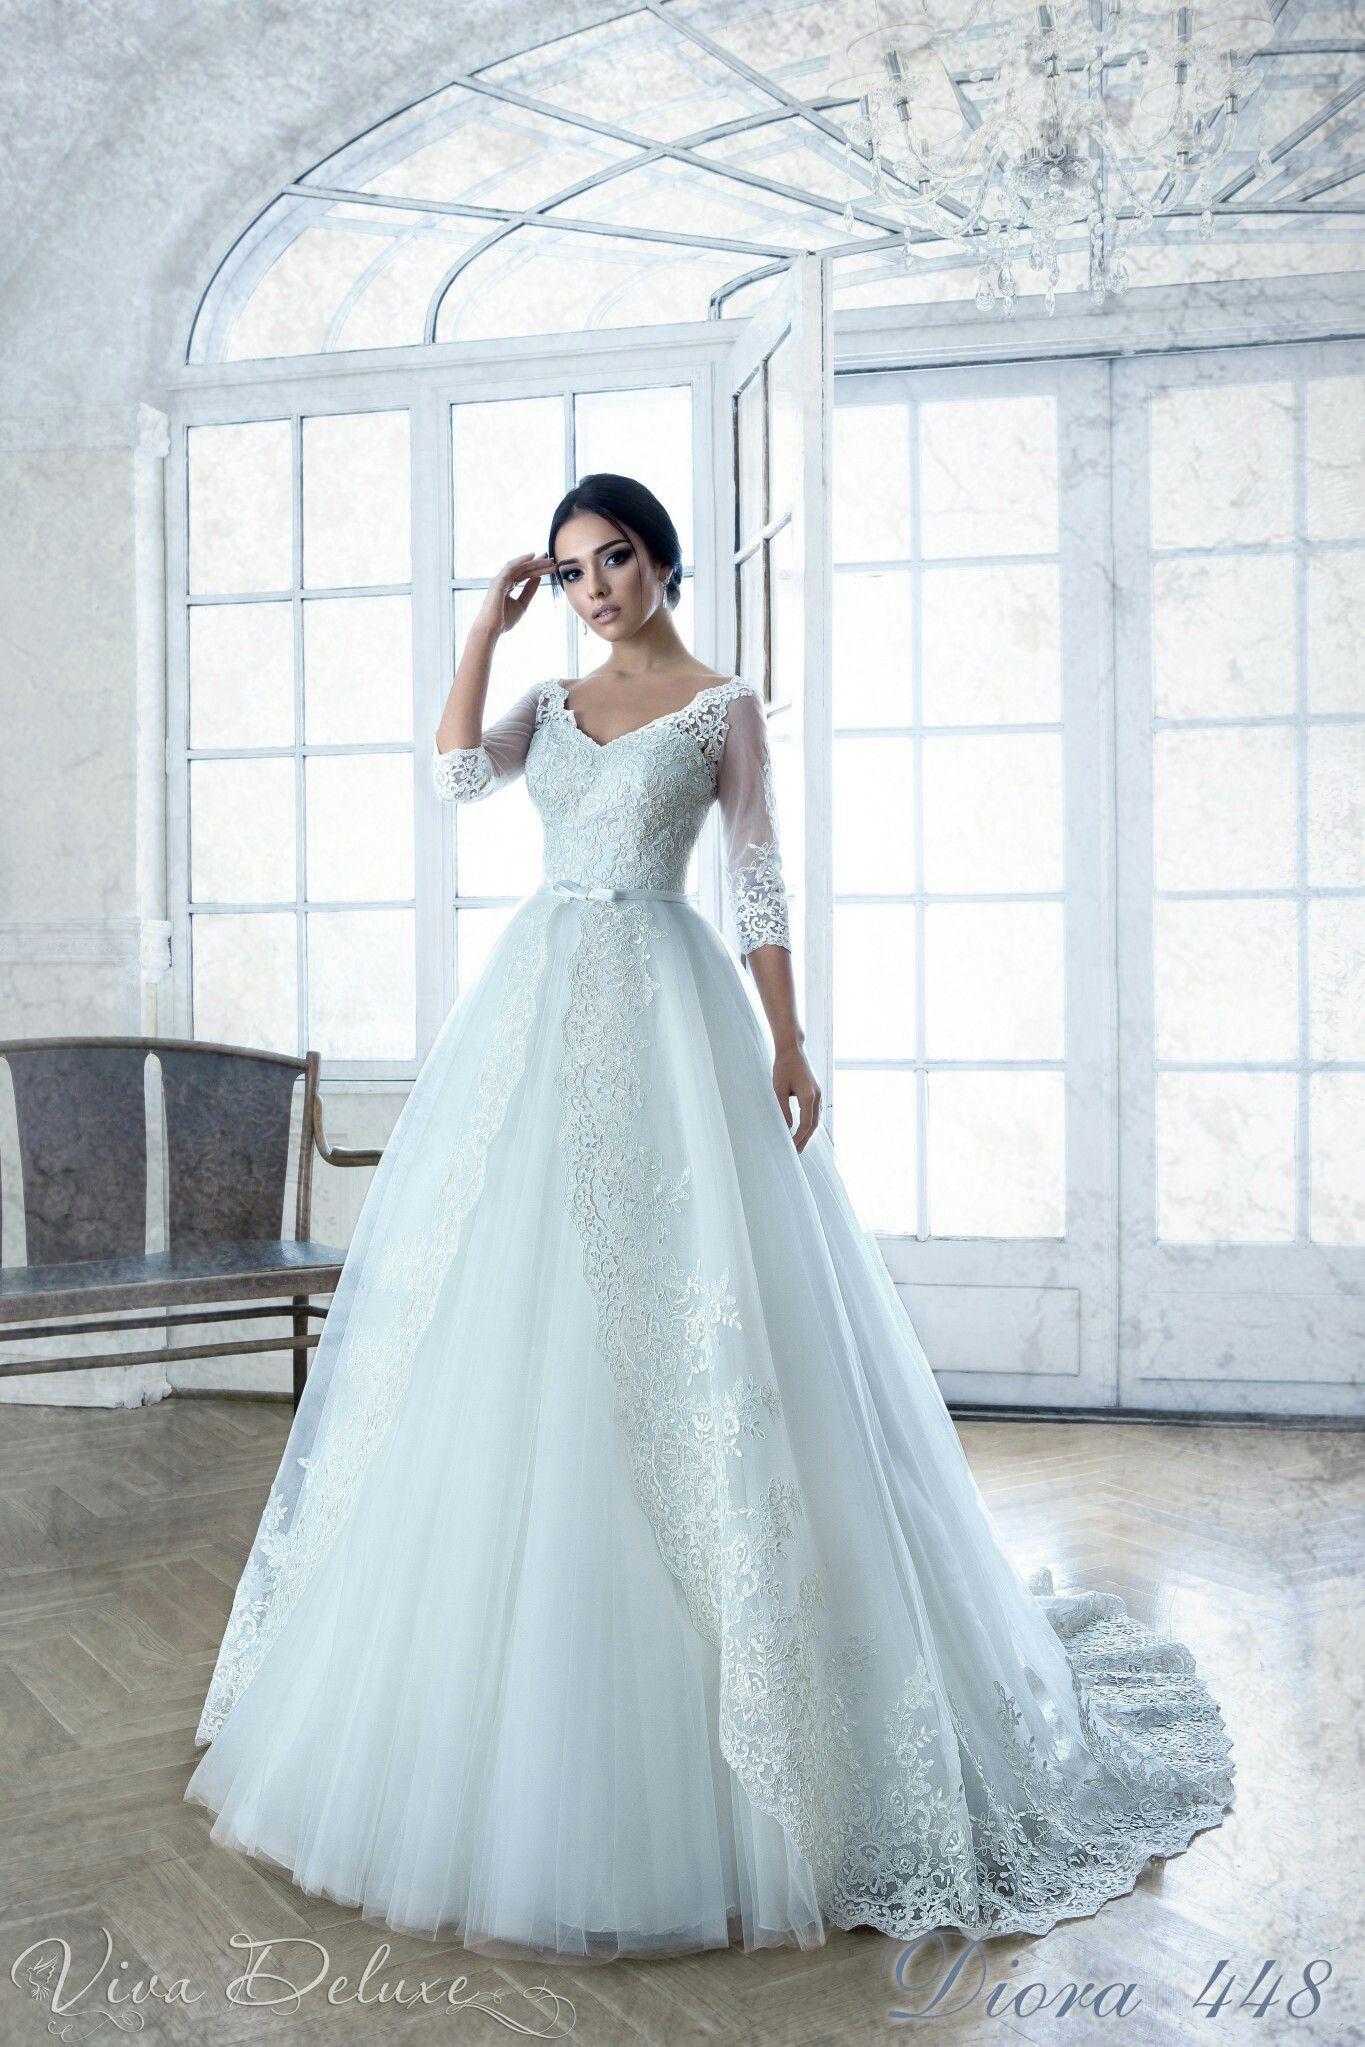 Pin de Patty Gallagher en Beautiful Brides | Pinterest